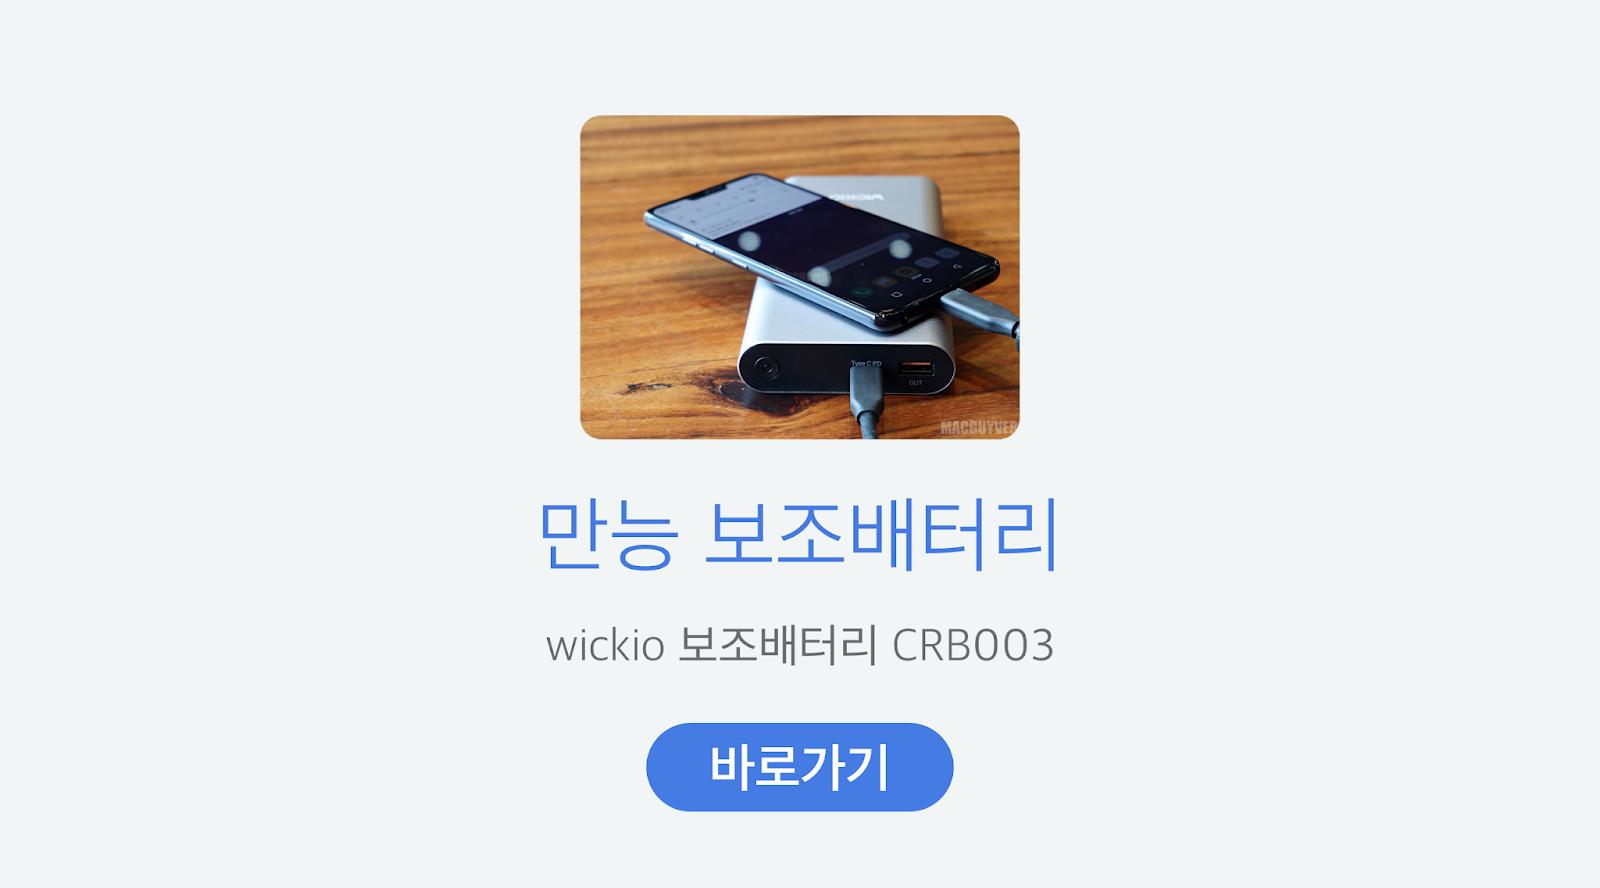 http://smartstore.naver.com/wickio/products/2451766517